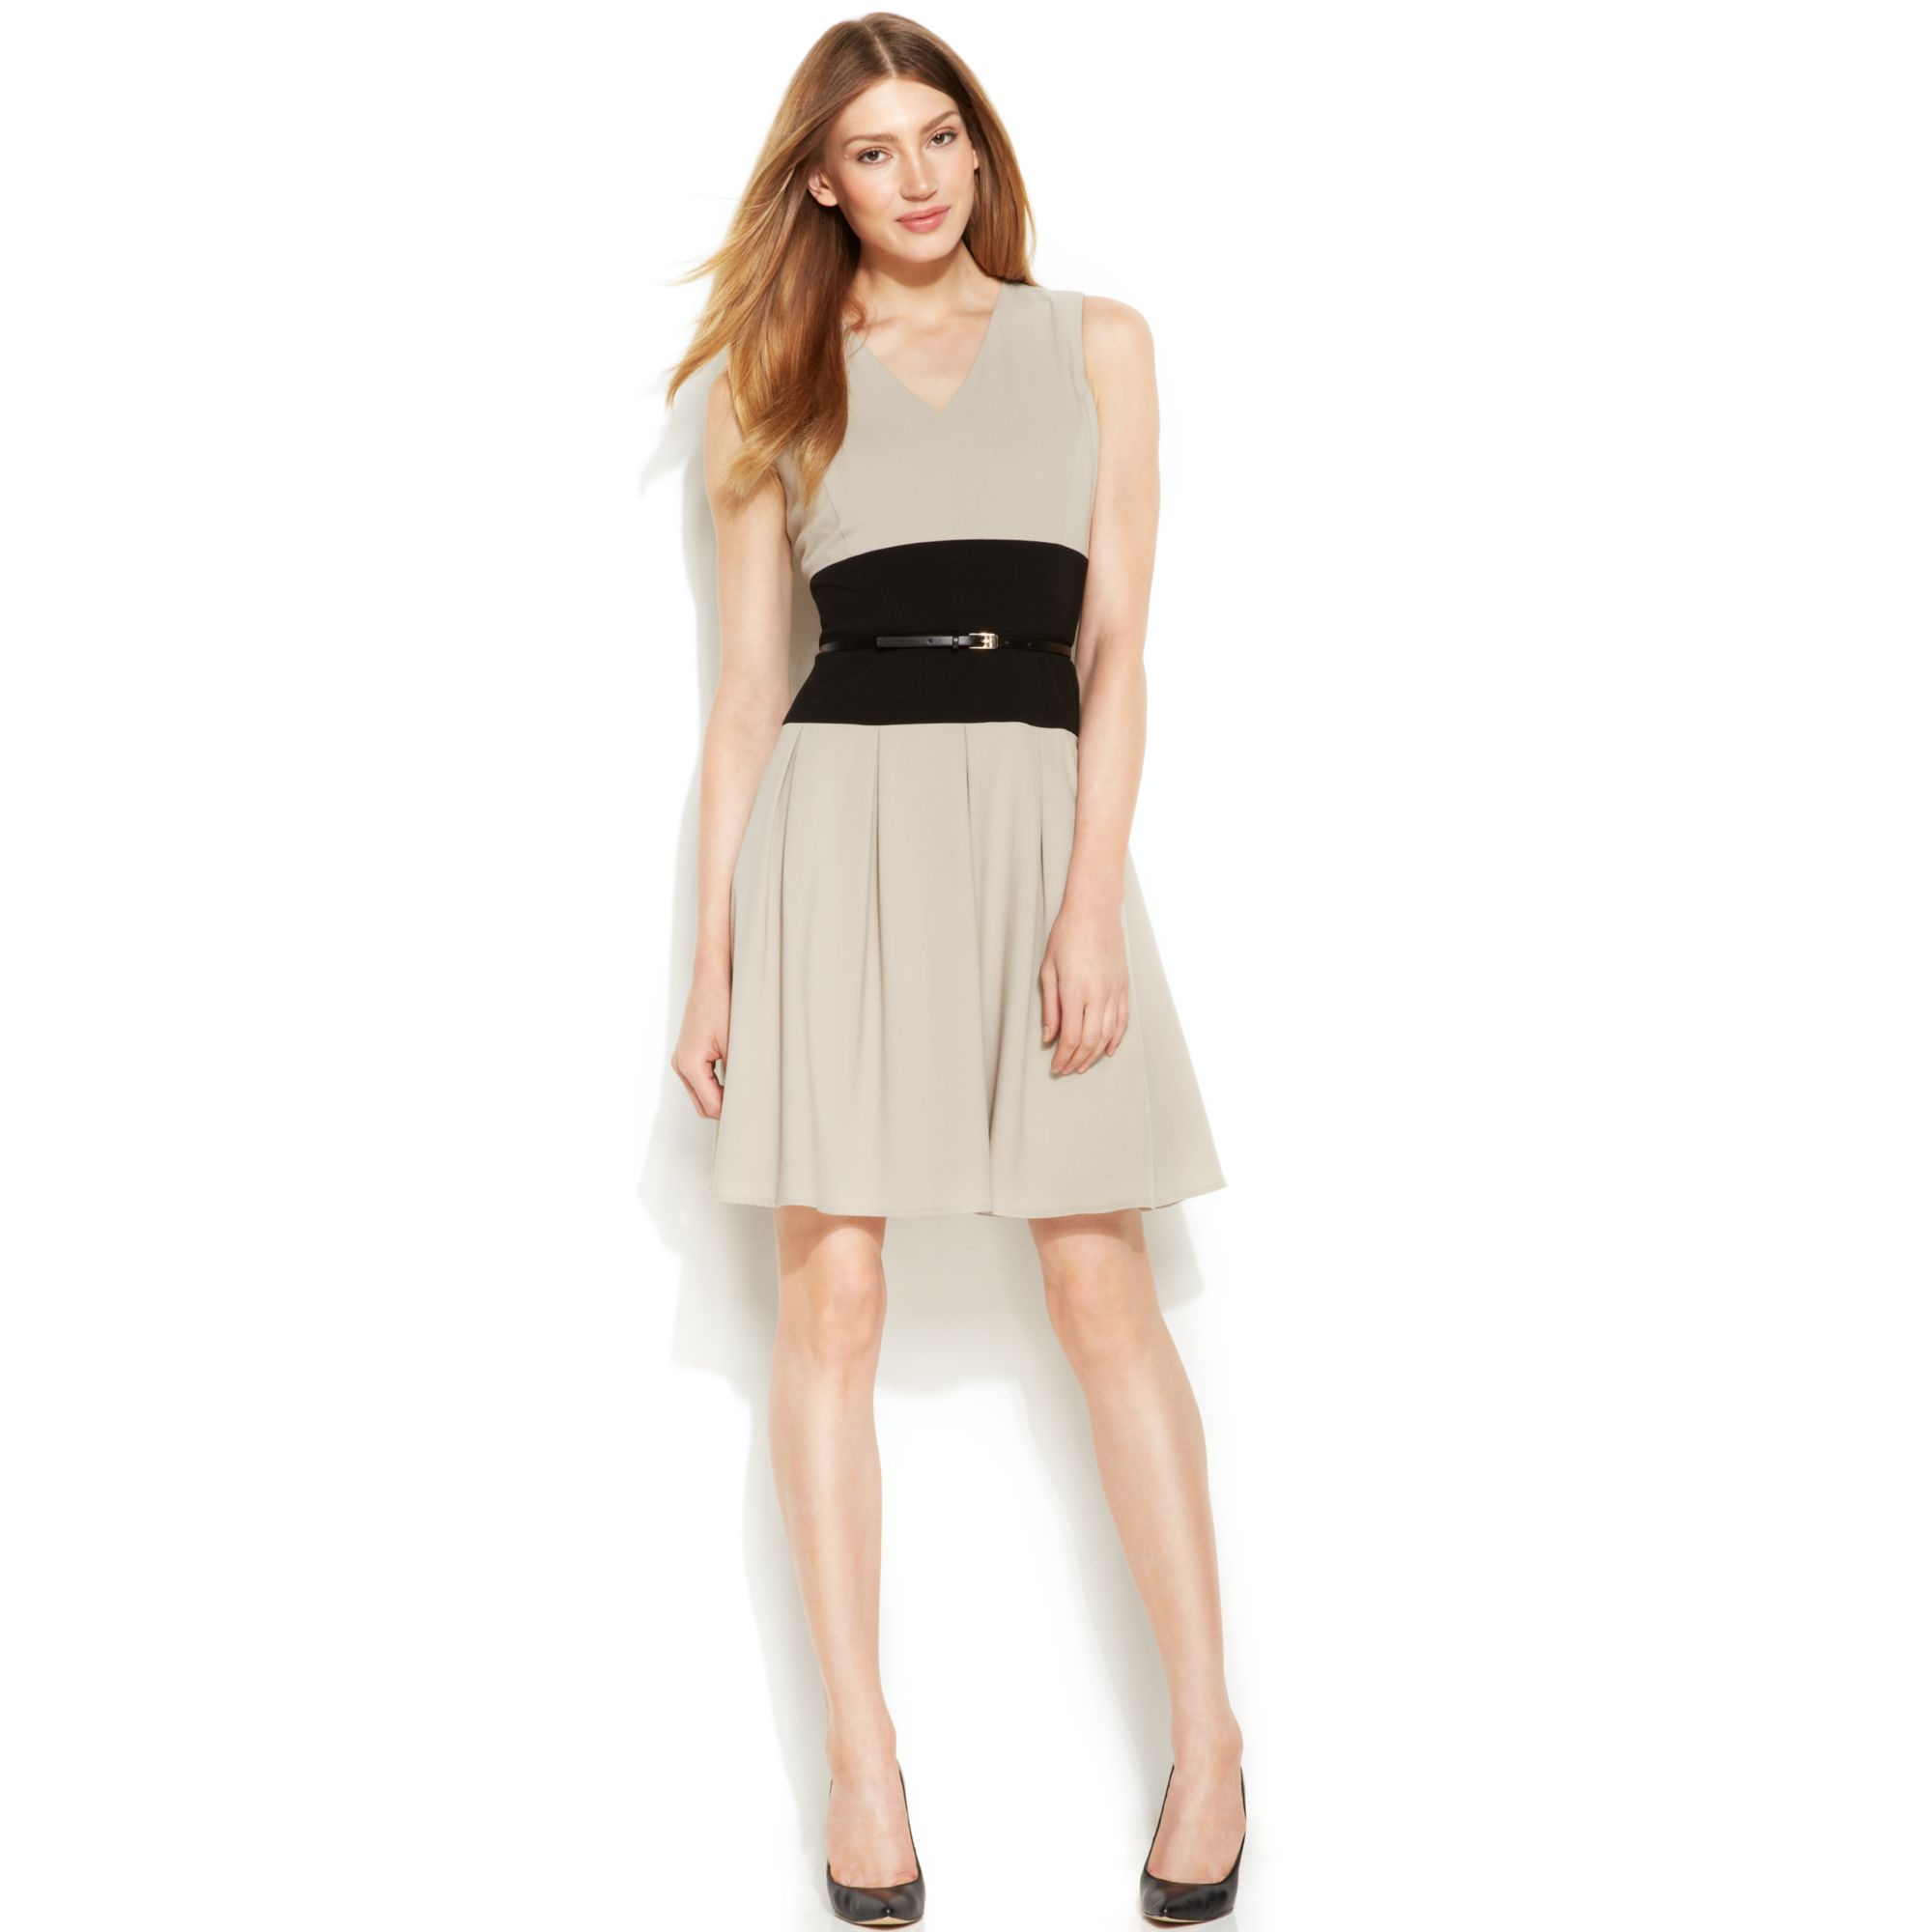 Calvin Klein Sleeveless Colorblock Belted Dress In Beige